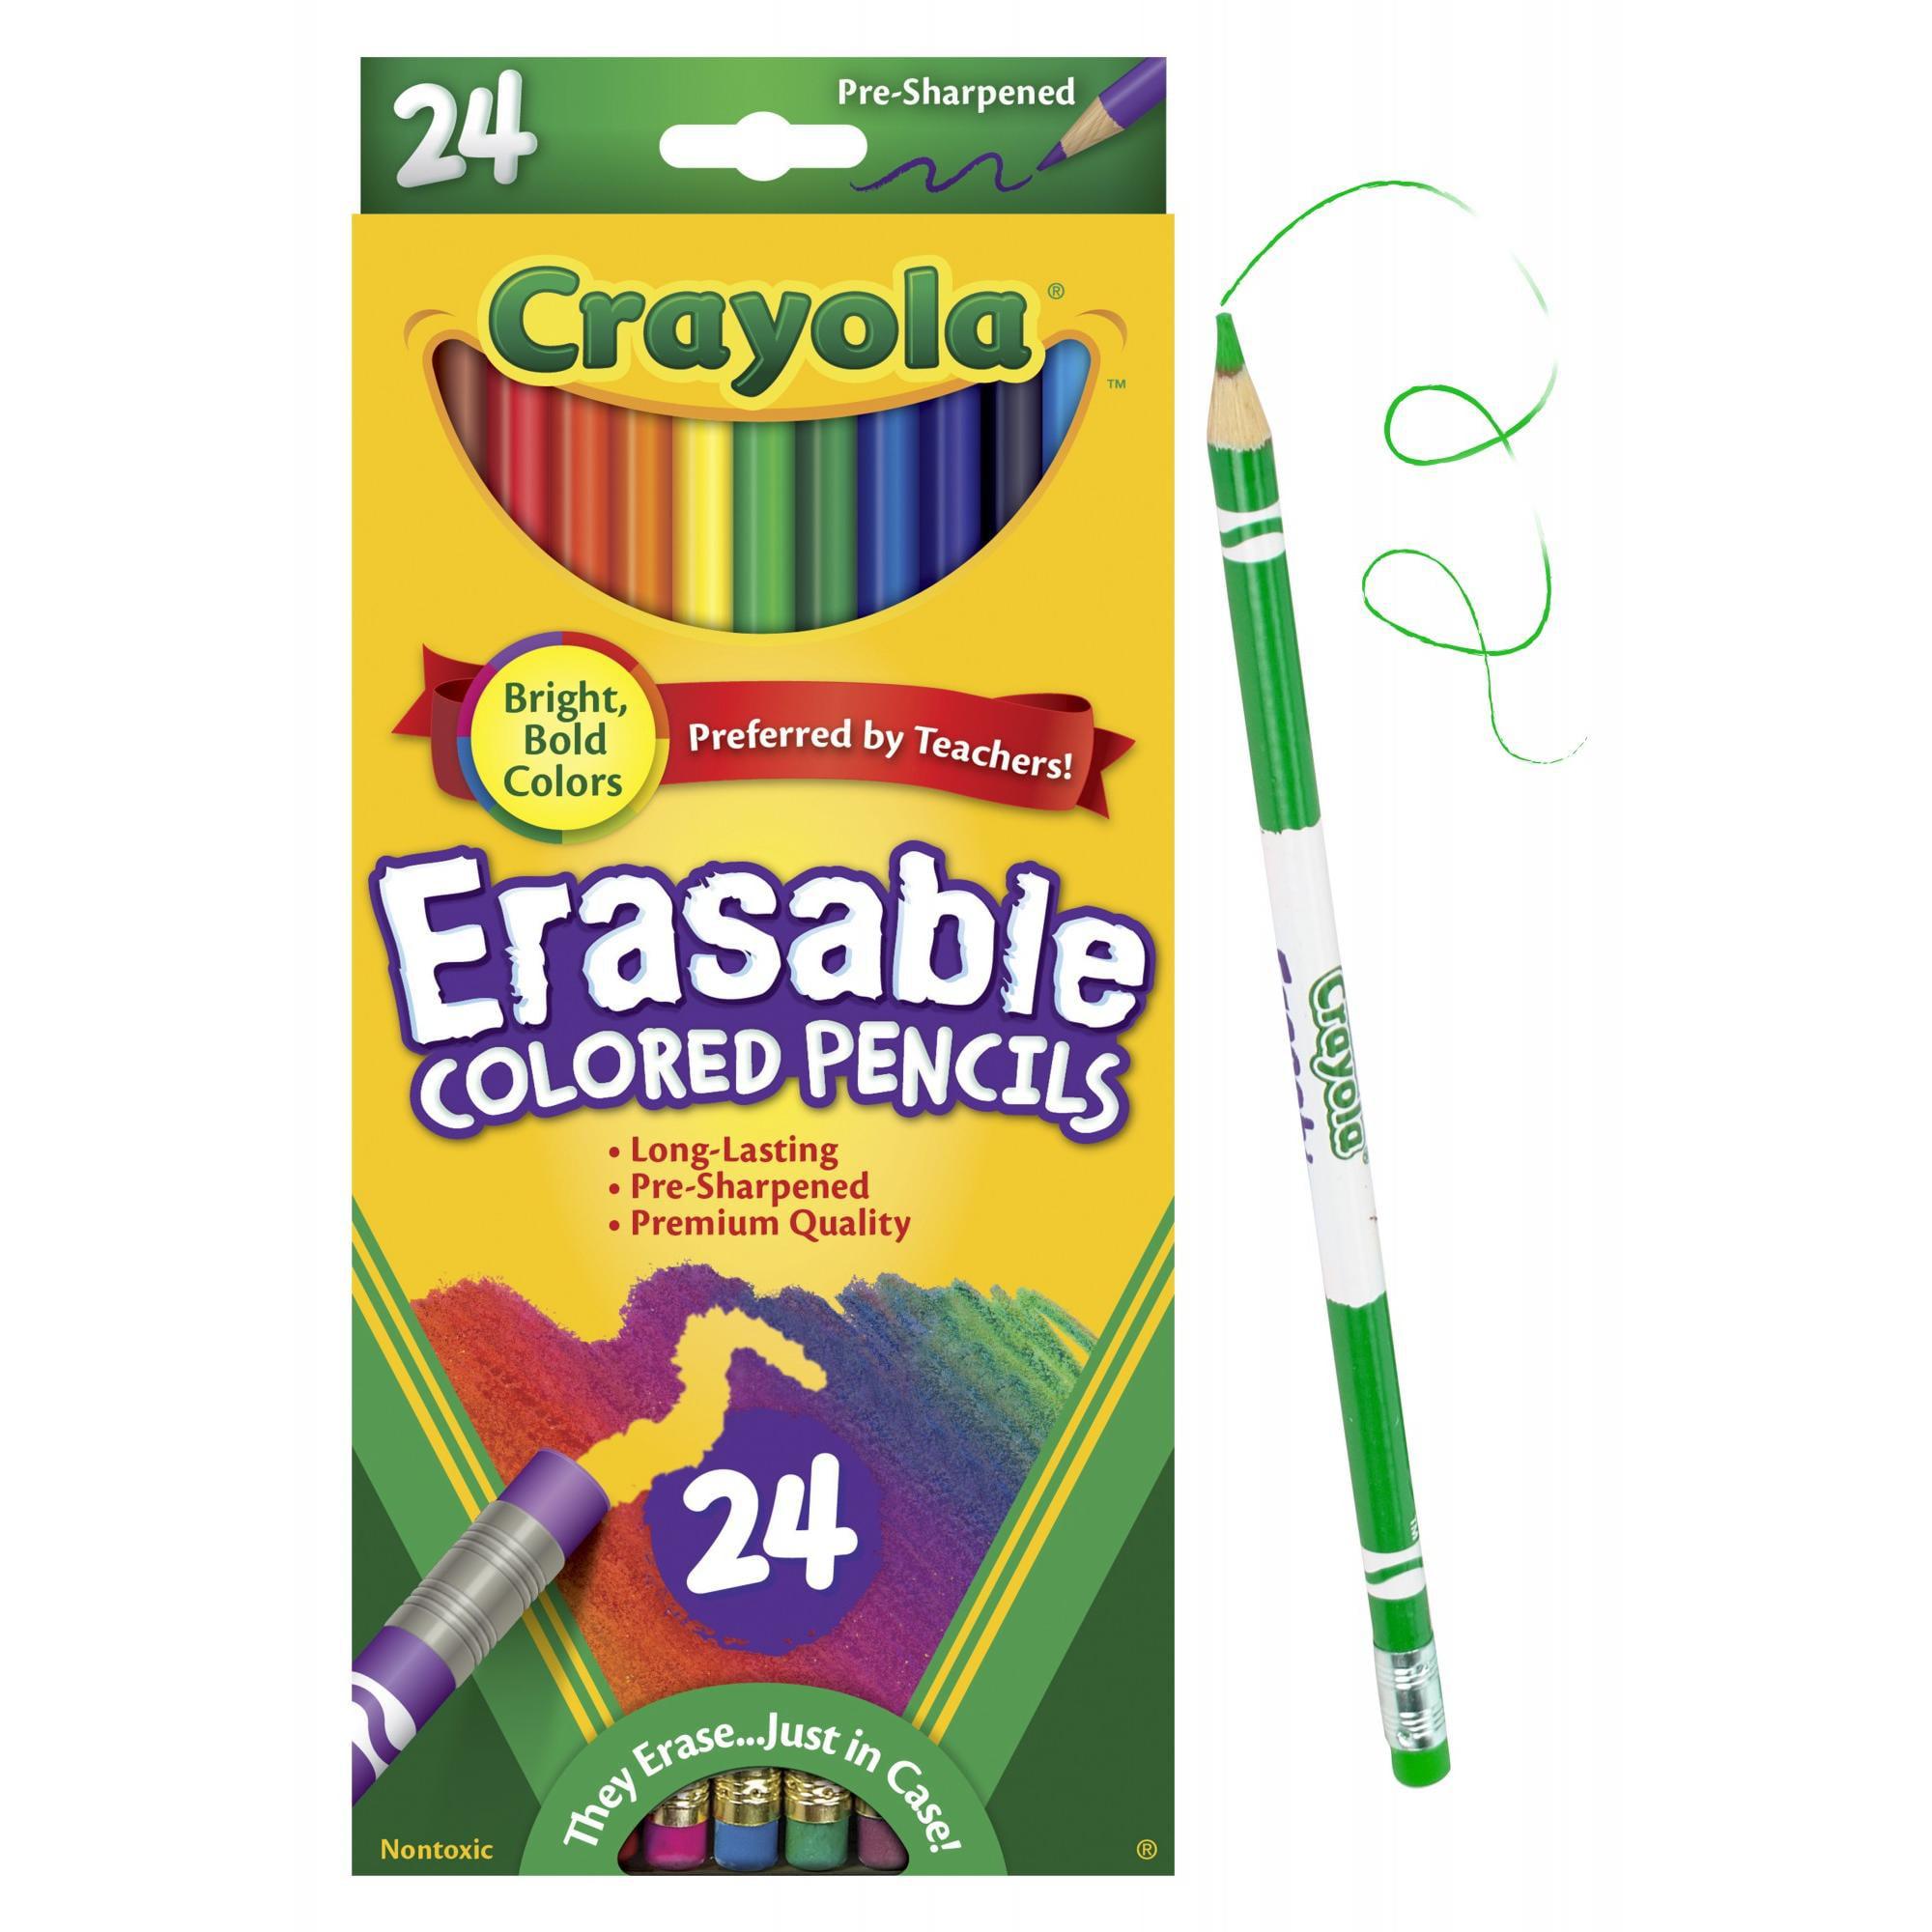 Crayola Eraseable Colored Pencils, 24 Count